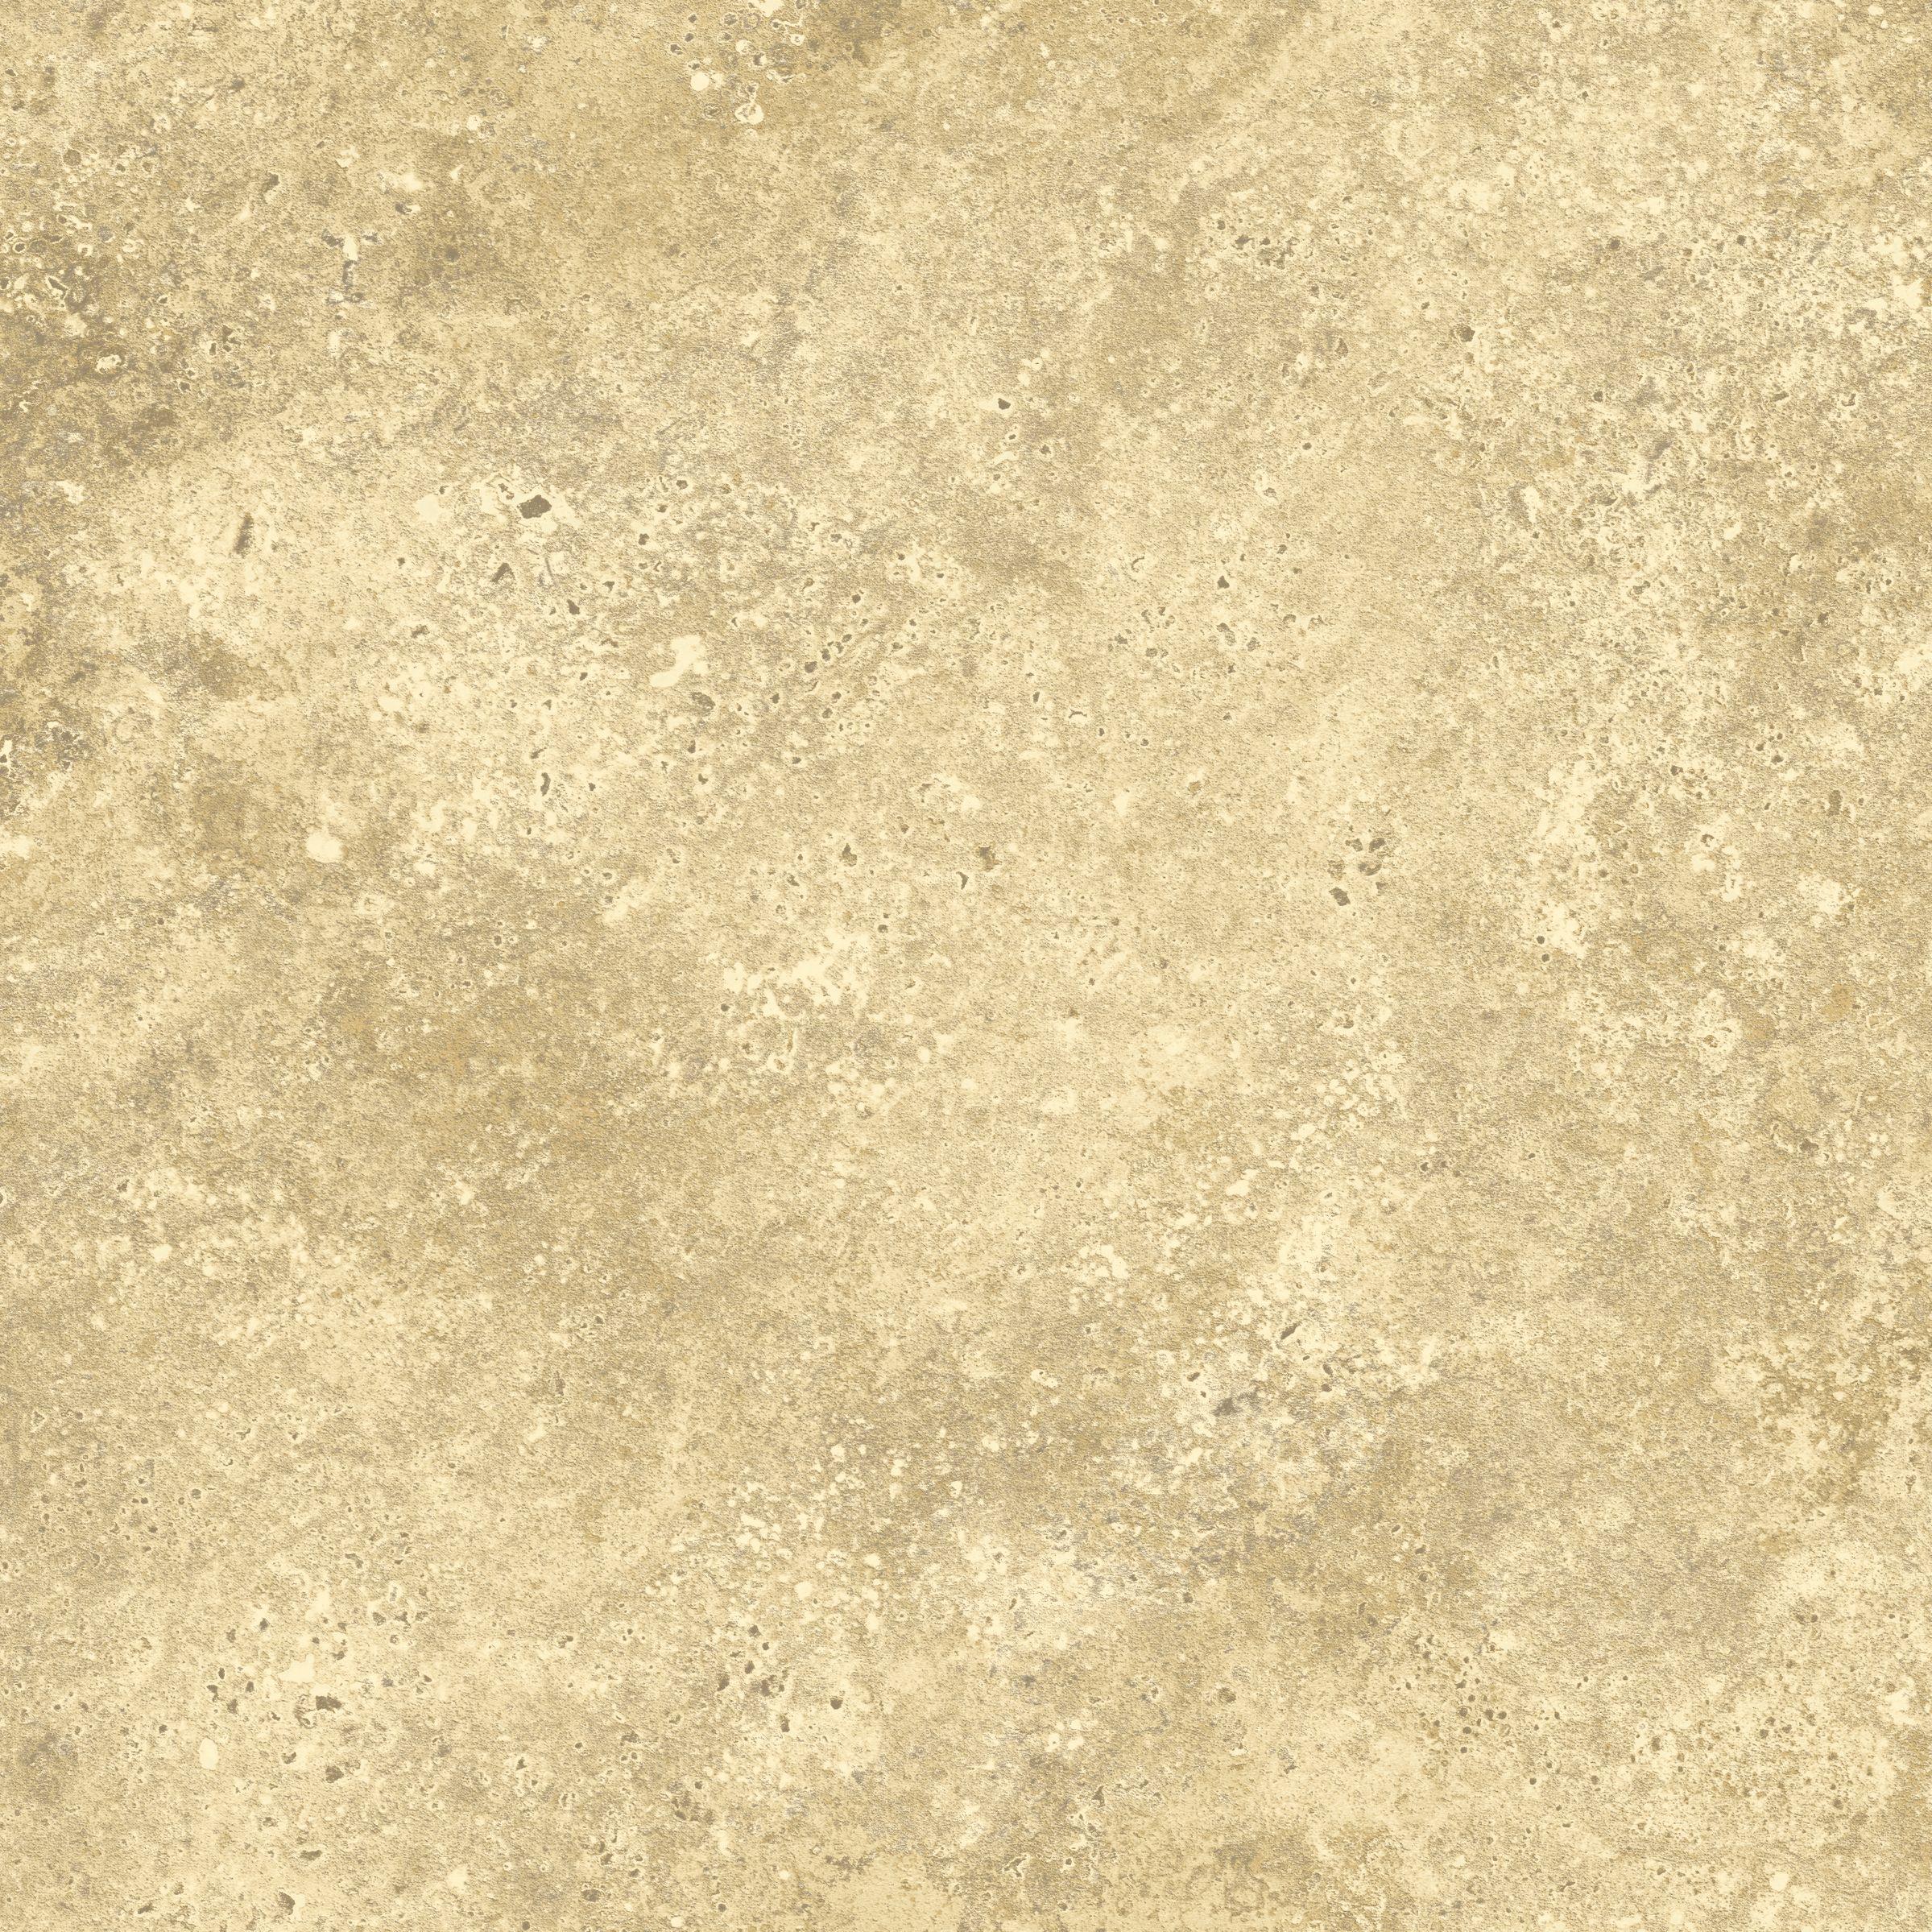 Panele winylowe LVT modulari ® STONE DRYBACK 32,9 x 65,9 cm 36223